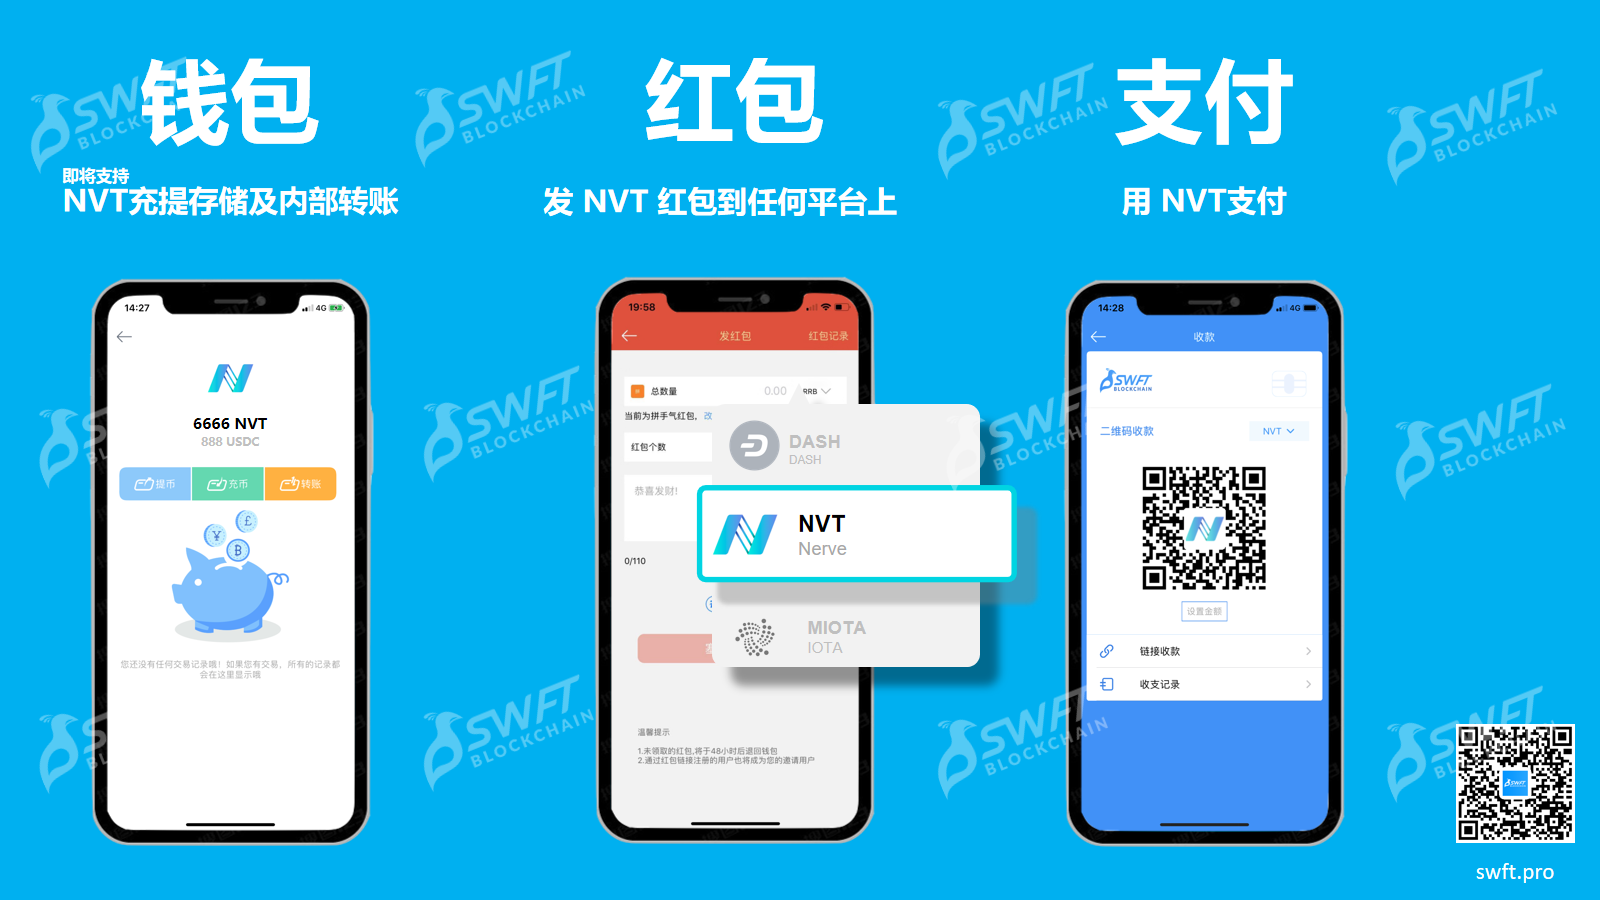 SWFT Blockchain 已上线NVT并将支持NVT空投